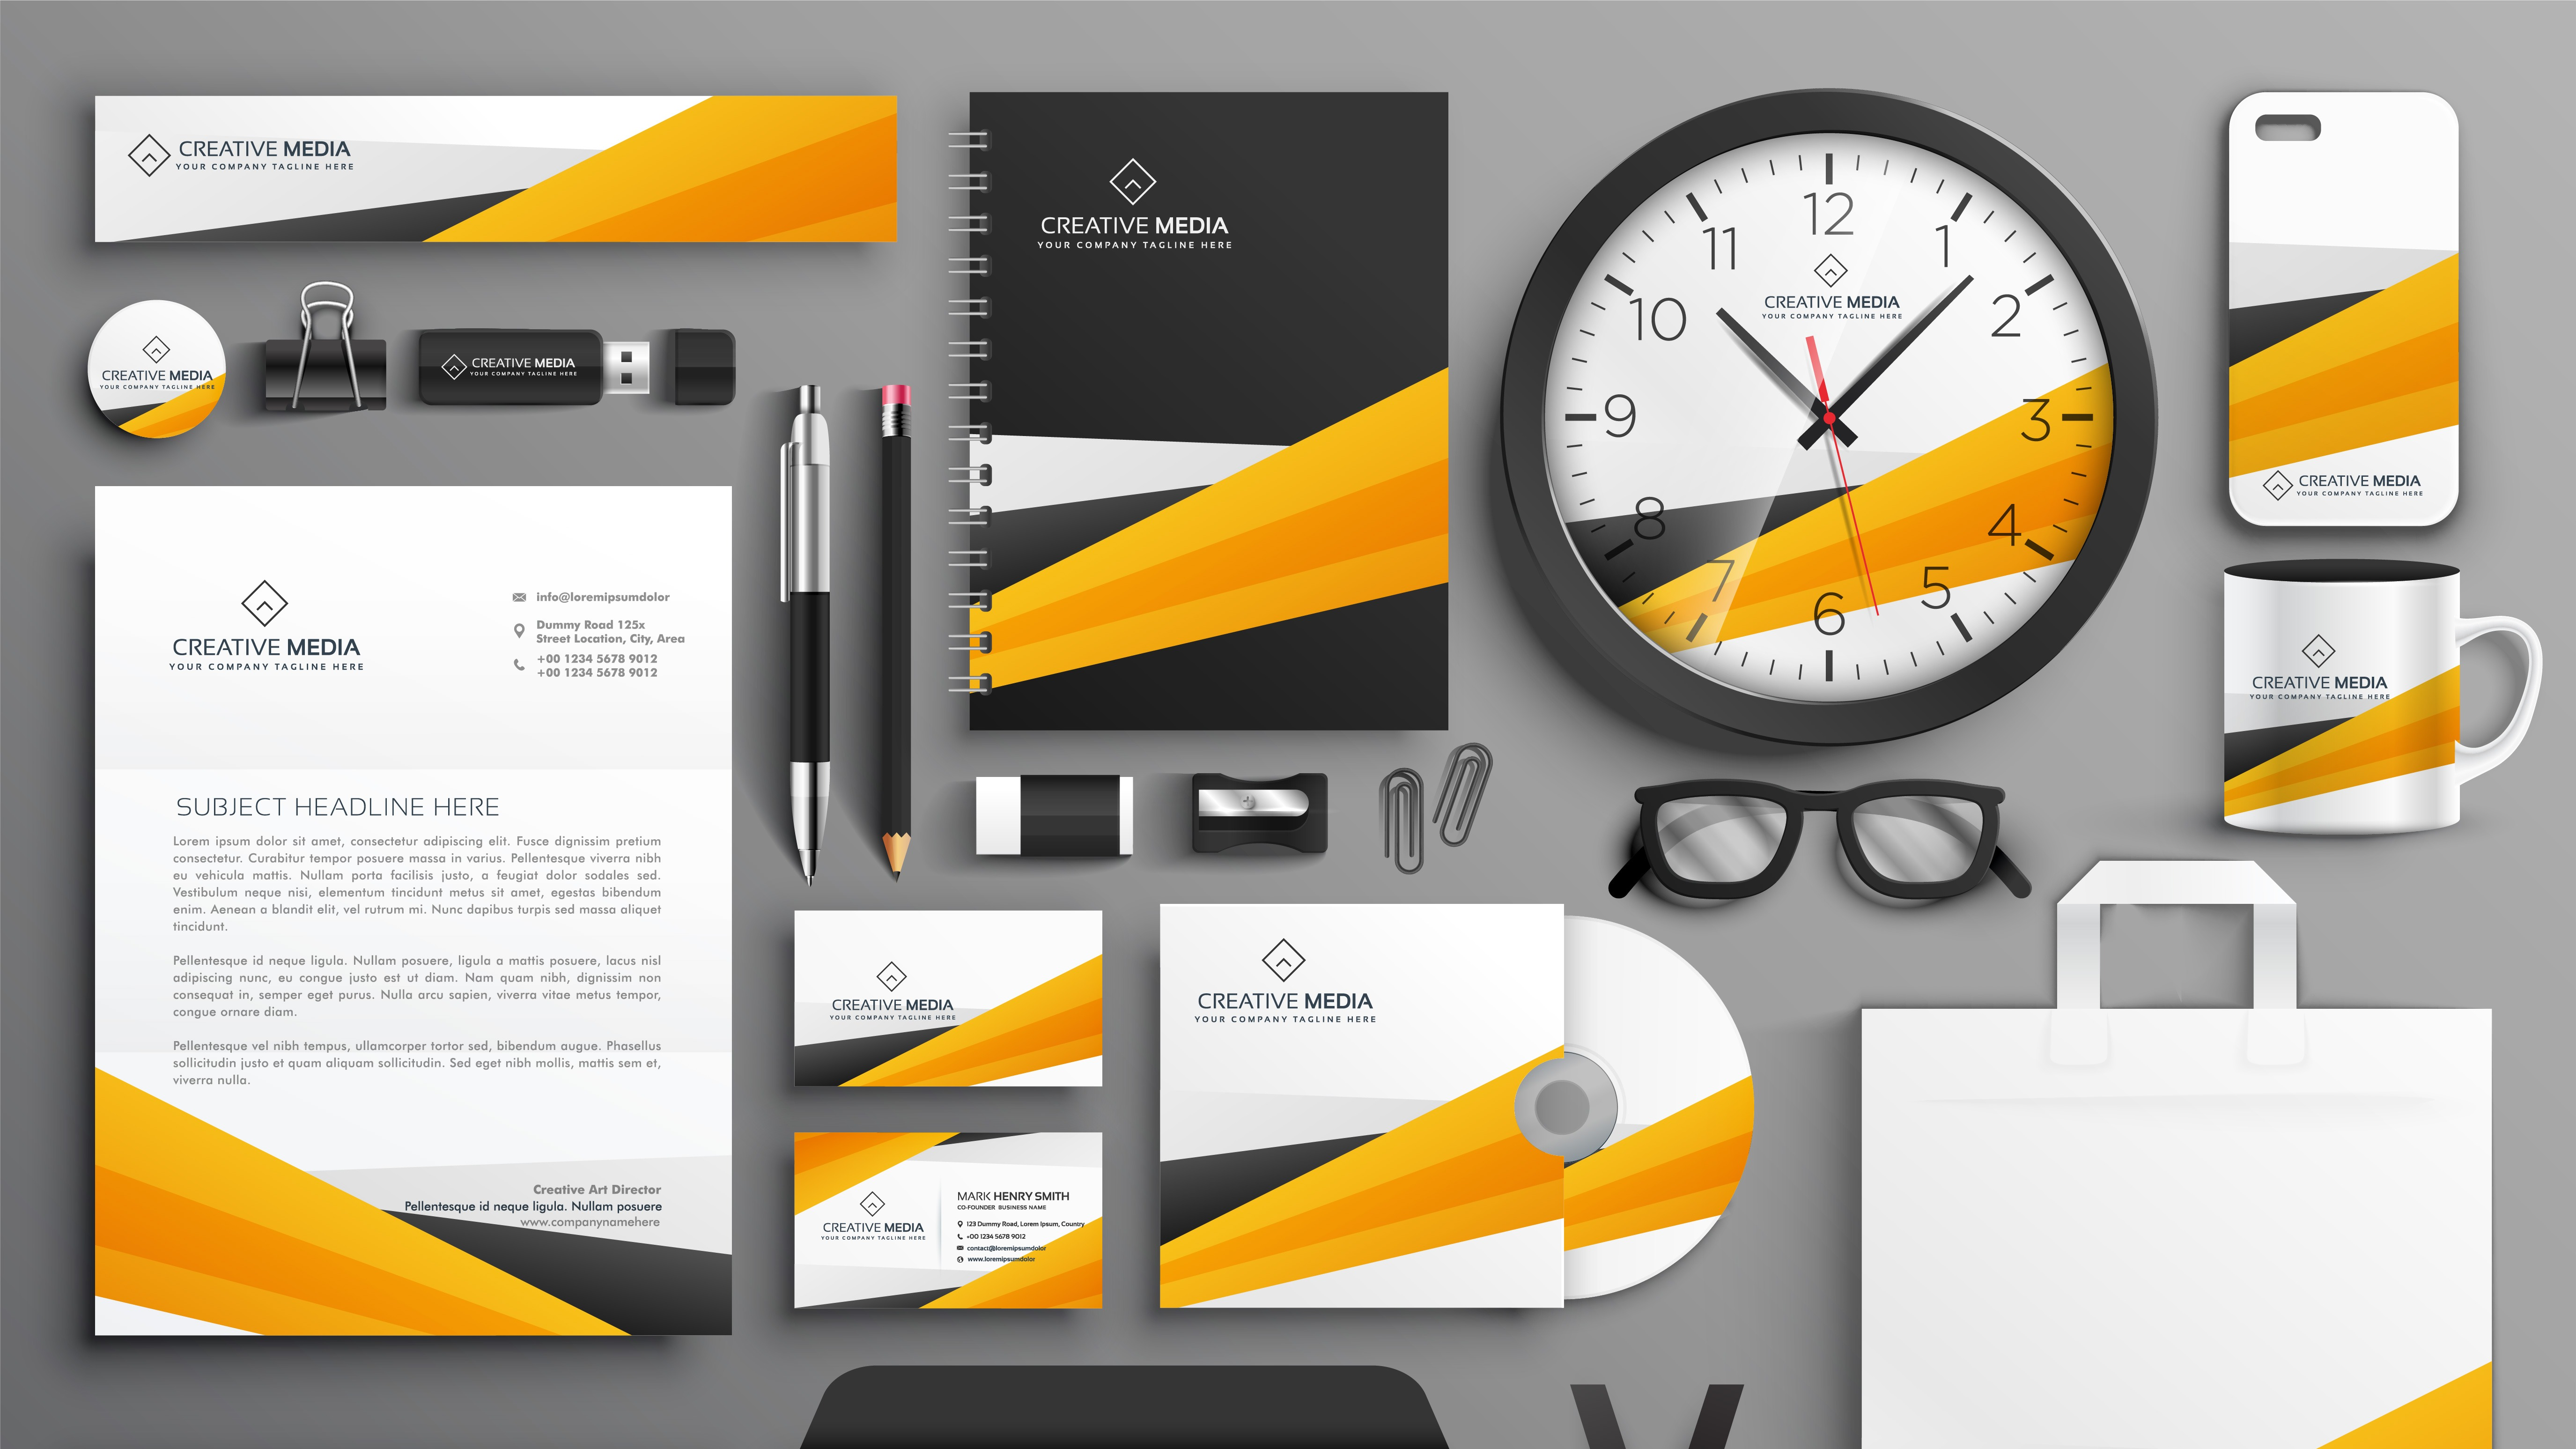 Diseño de imagen corporativa sin logo